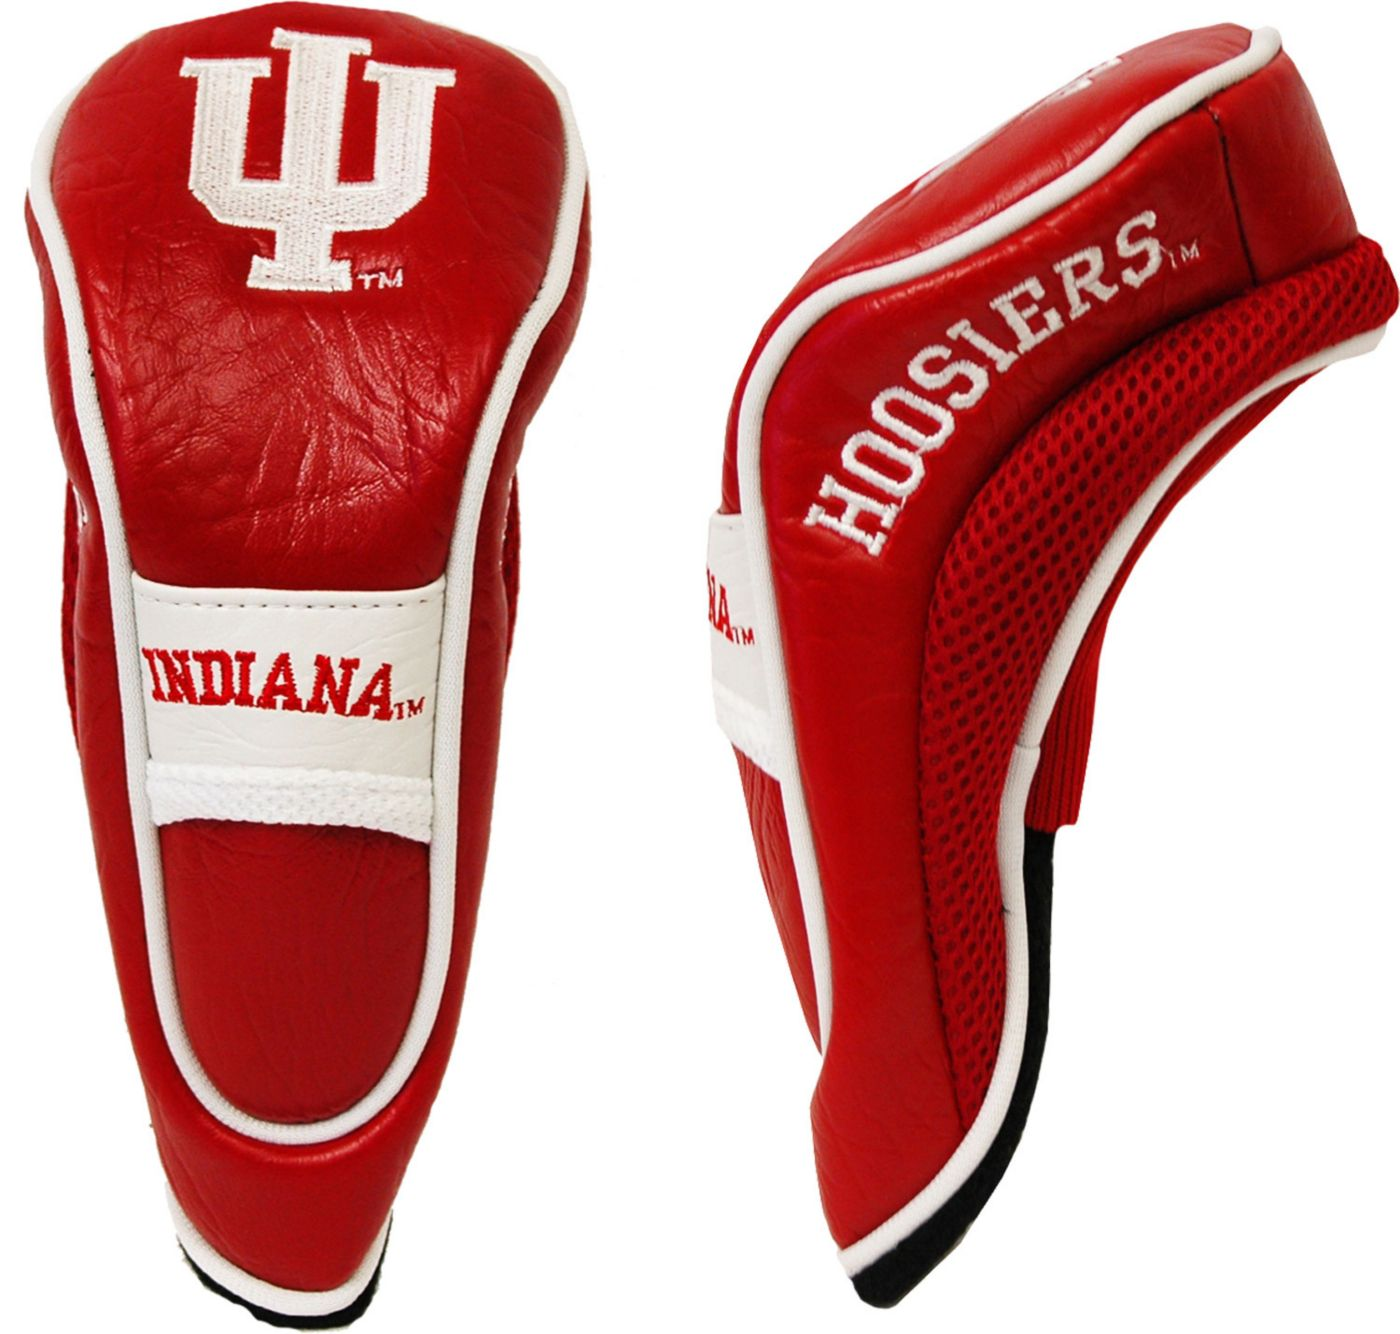 Team Golf Indiana Hoosiers Hybrid Headcover